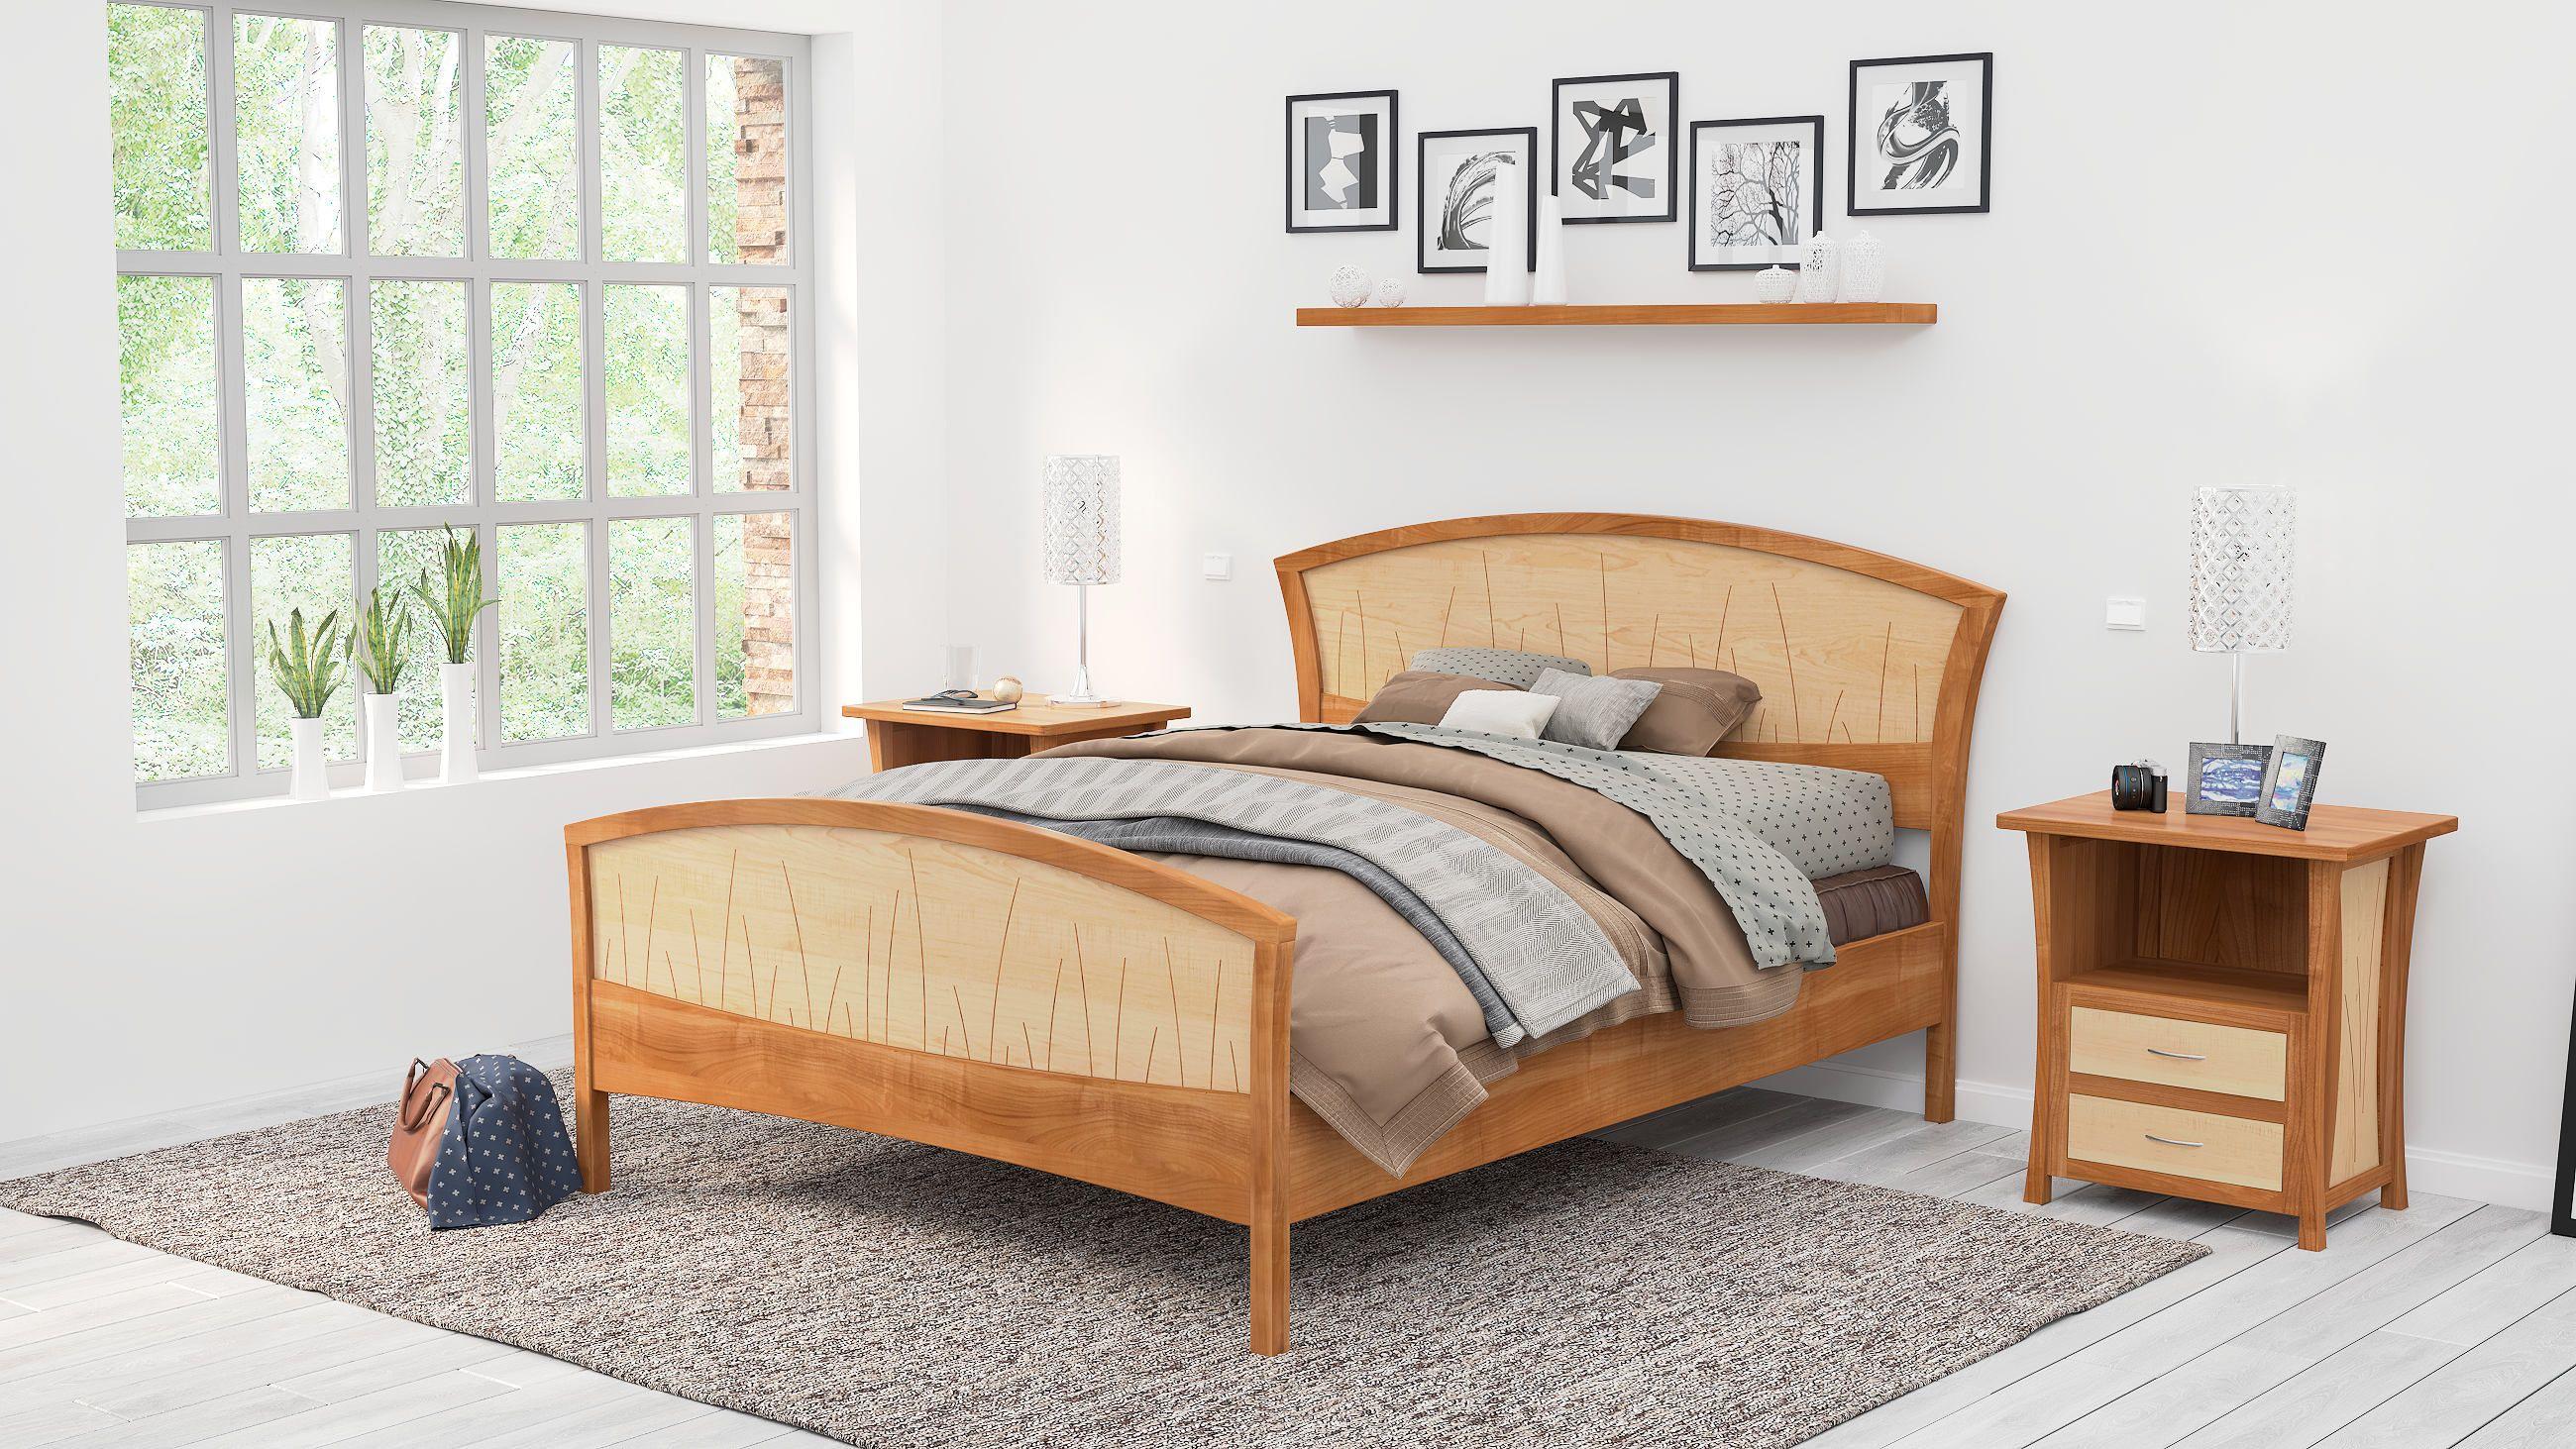 Bed Frame King Size, Headboard, Platform Bed, Queen, Art